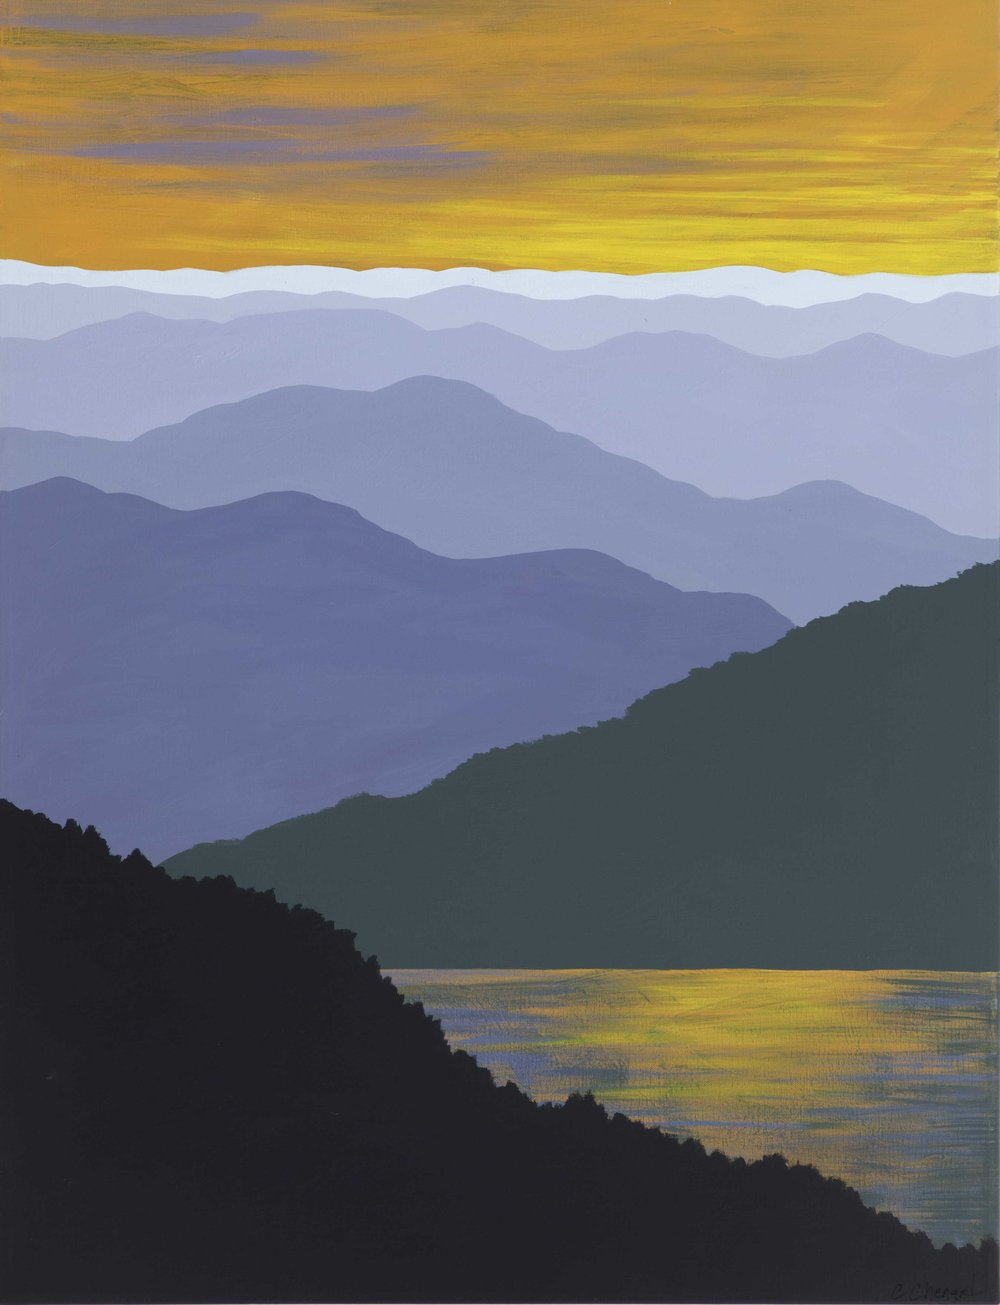 """SUNSET LAKE"",  Acrylic on Canvas,  30x40 inches,  $800"